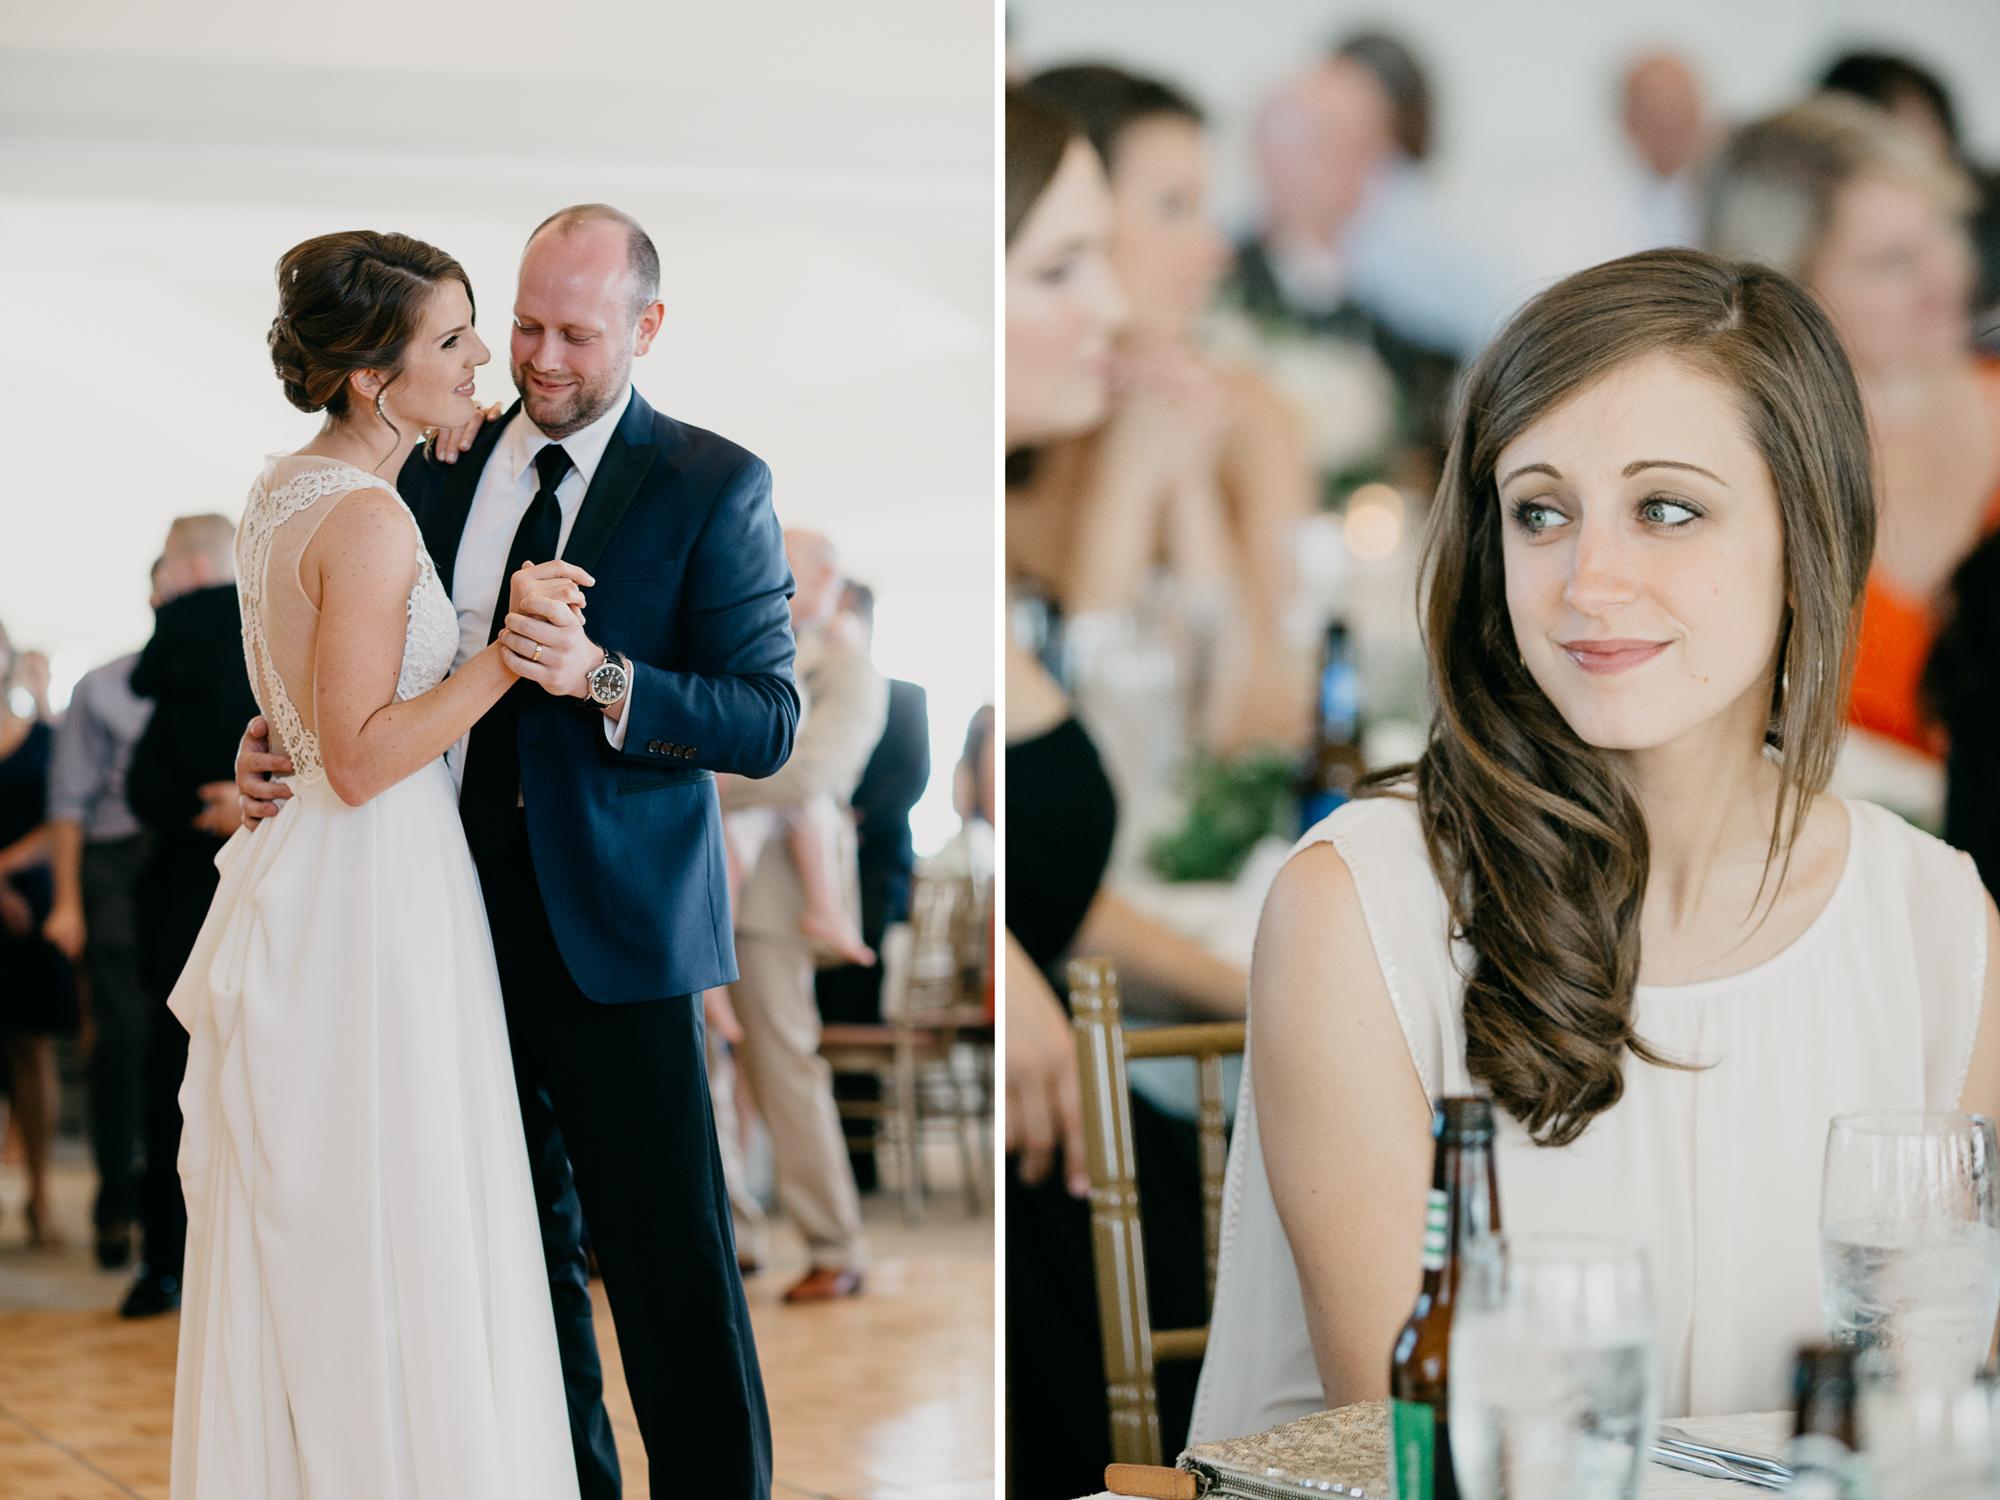 Jaclyn_Andrew_quincy_massachusetts_wedding027.jpg